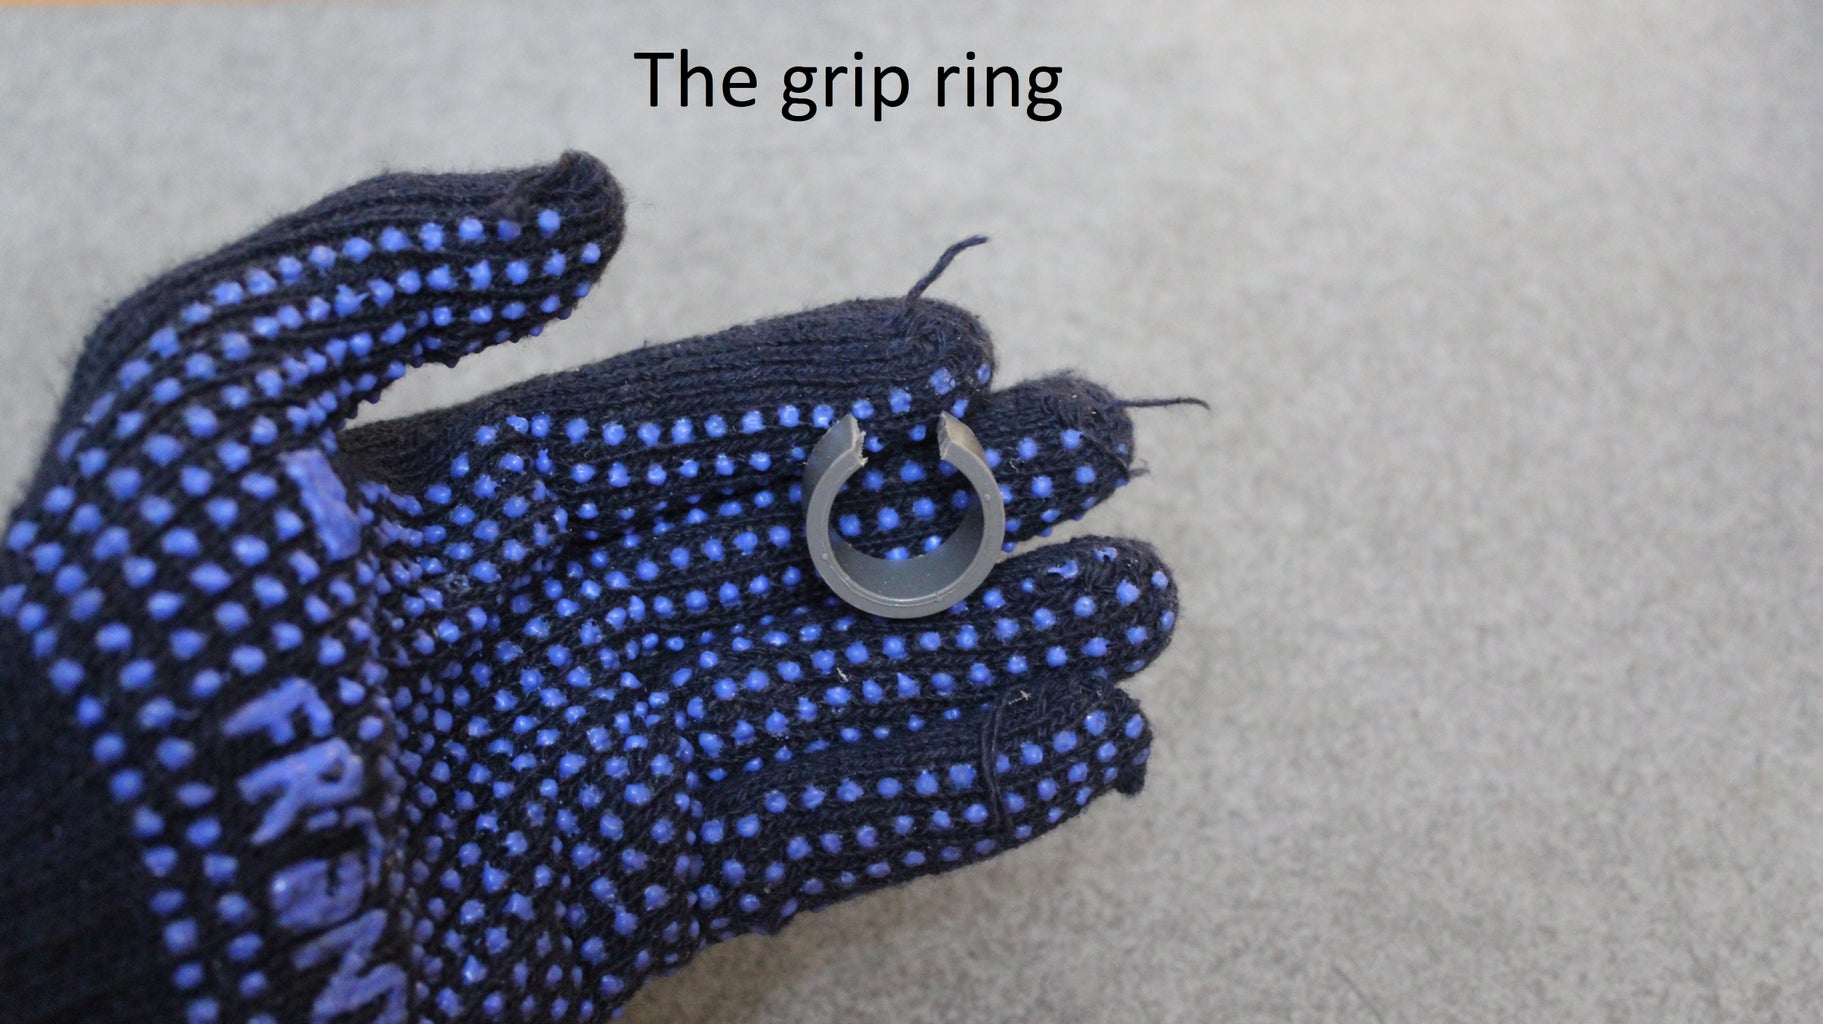 The Male Threaded Socket